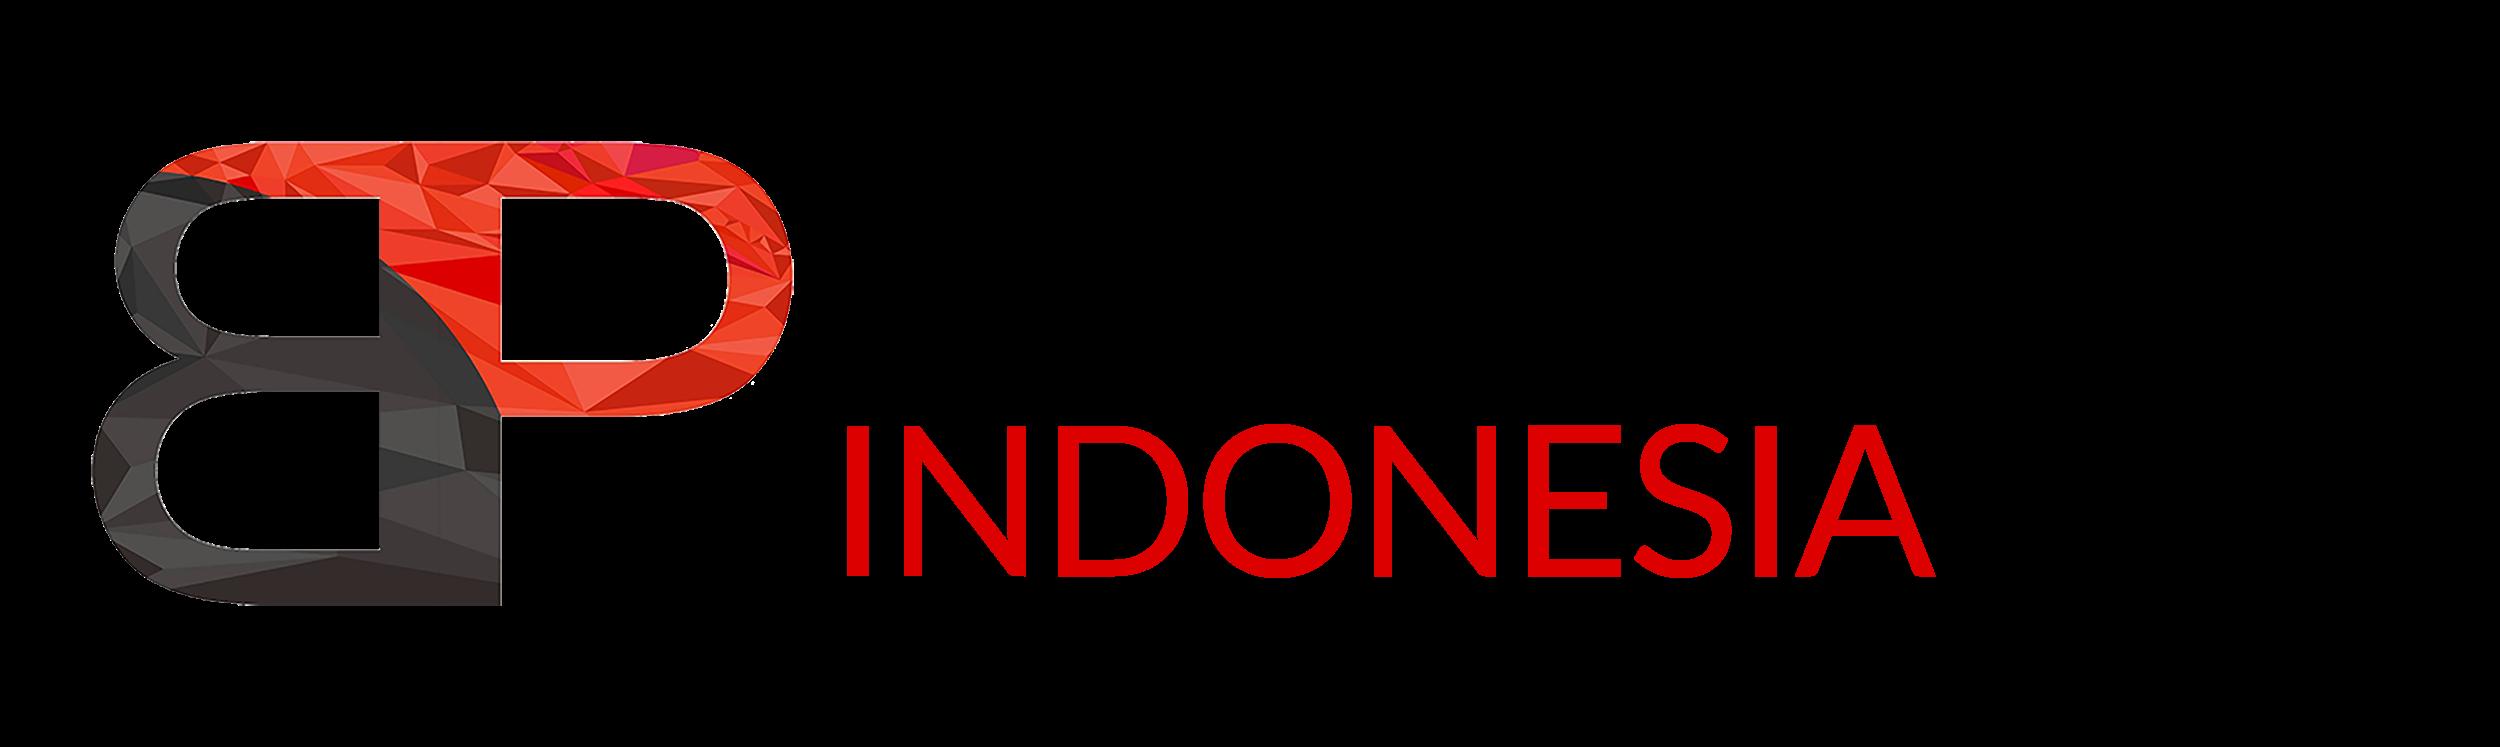 Bengkel Print Indonesia